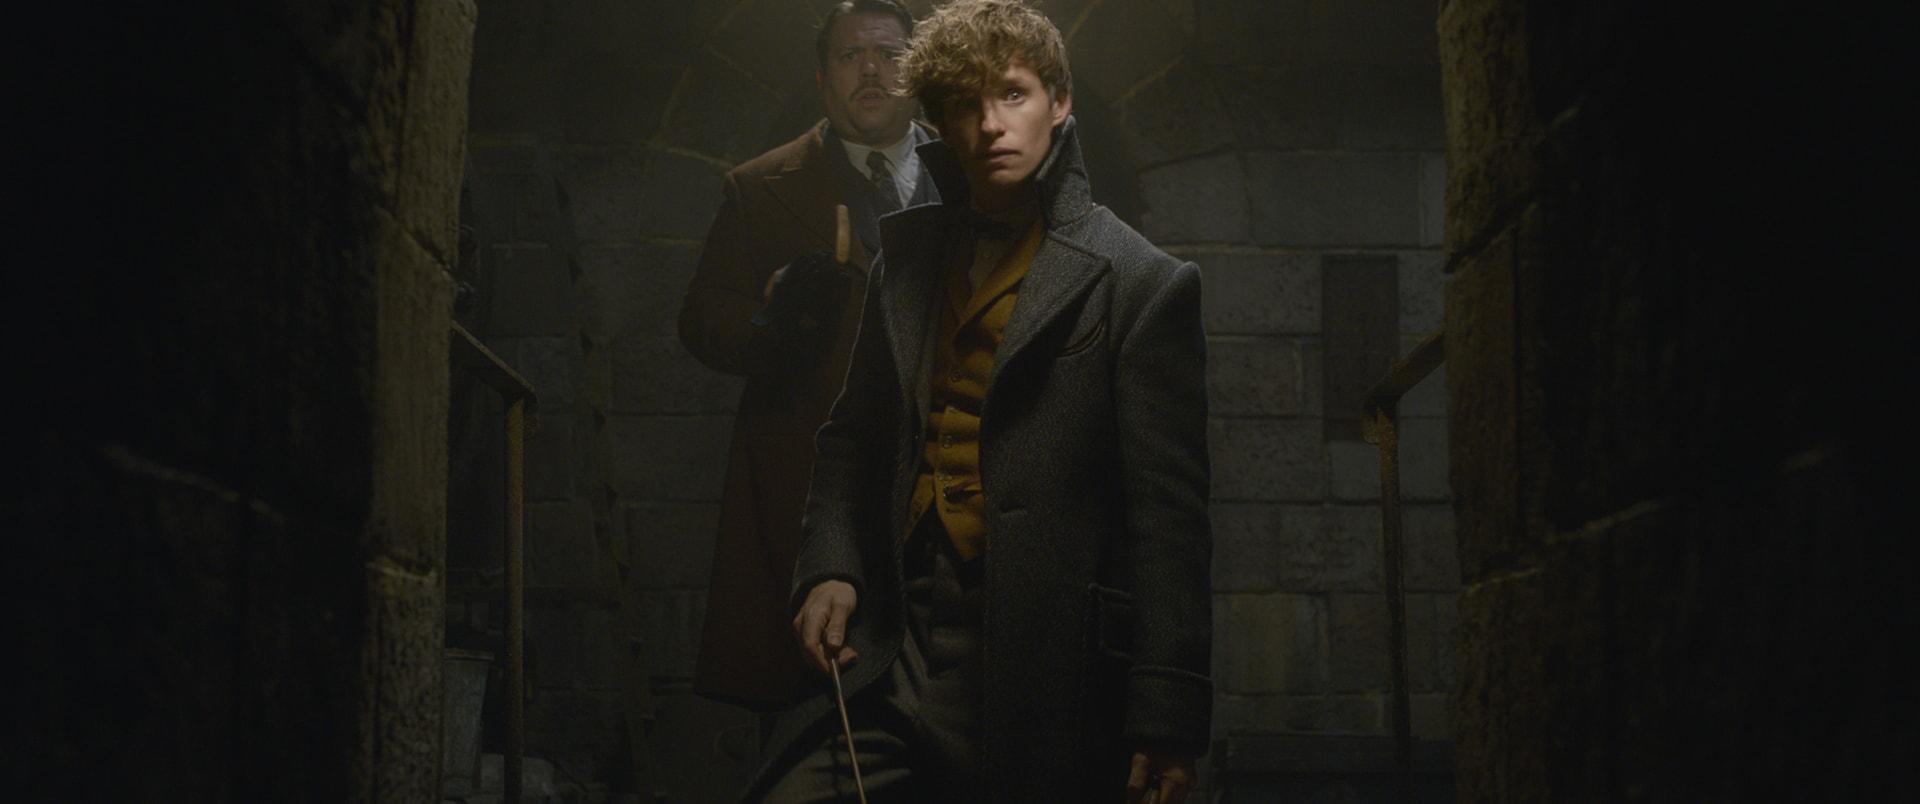 "(L-r) DAN FOGLER as Jacob Kowalski andEDDIE REDMAYNE as Newt Scamander in Warner Bros. Pictures' fantasy adventure ""FANTASTIC BEASTS: THE CRIMES OF GRINDELWALD,"" a Warner Bros. Pictures release."